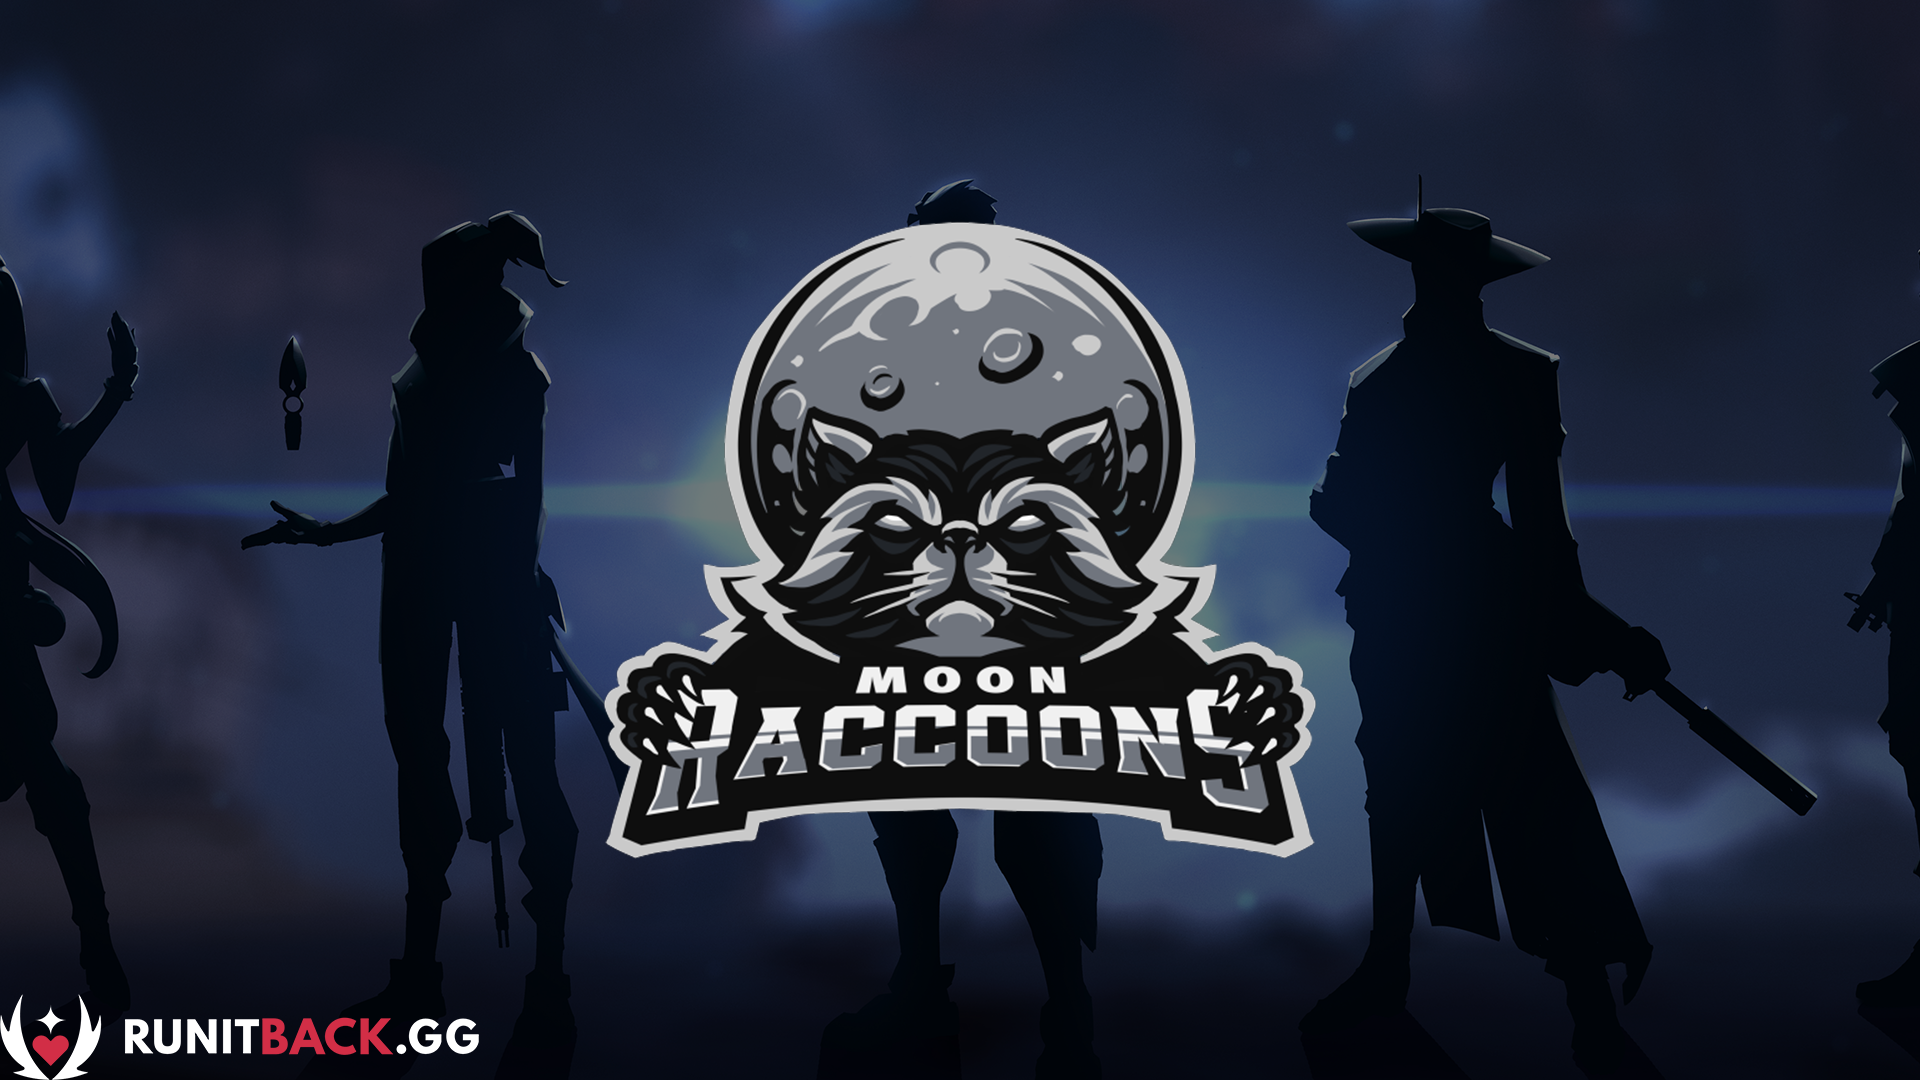 Moon Raccoons lose three